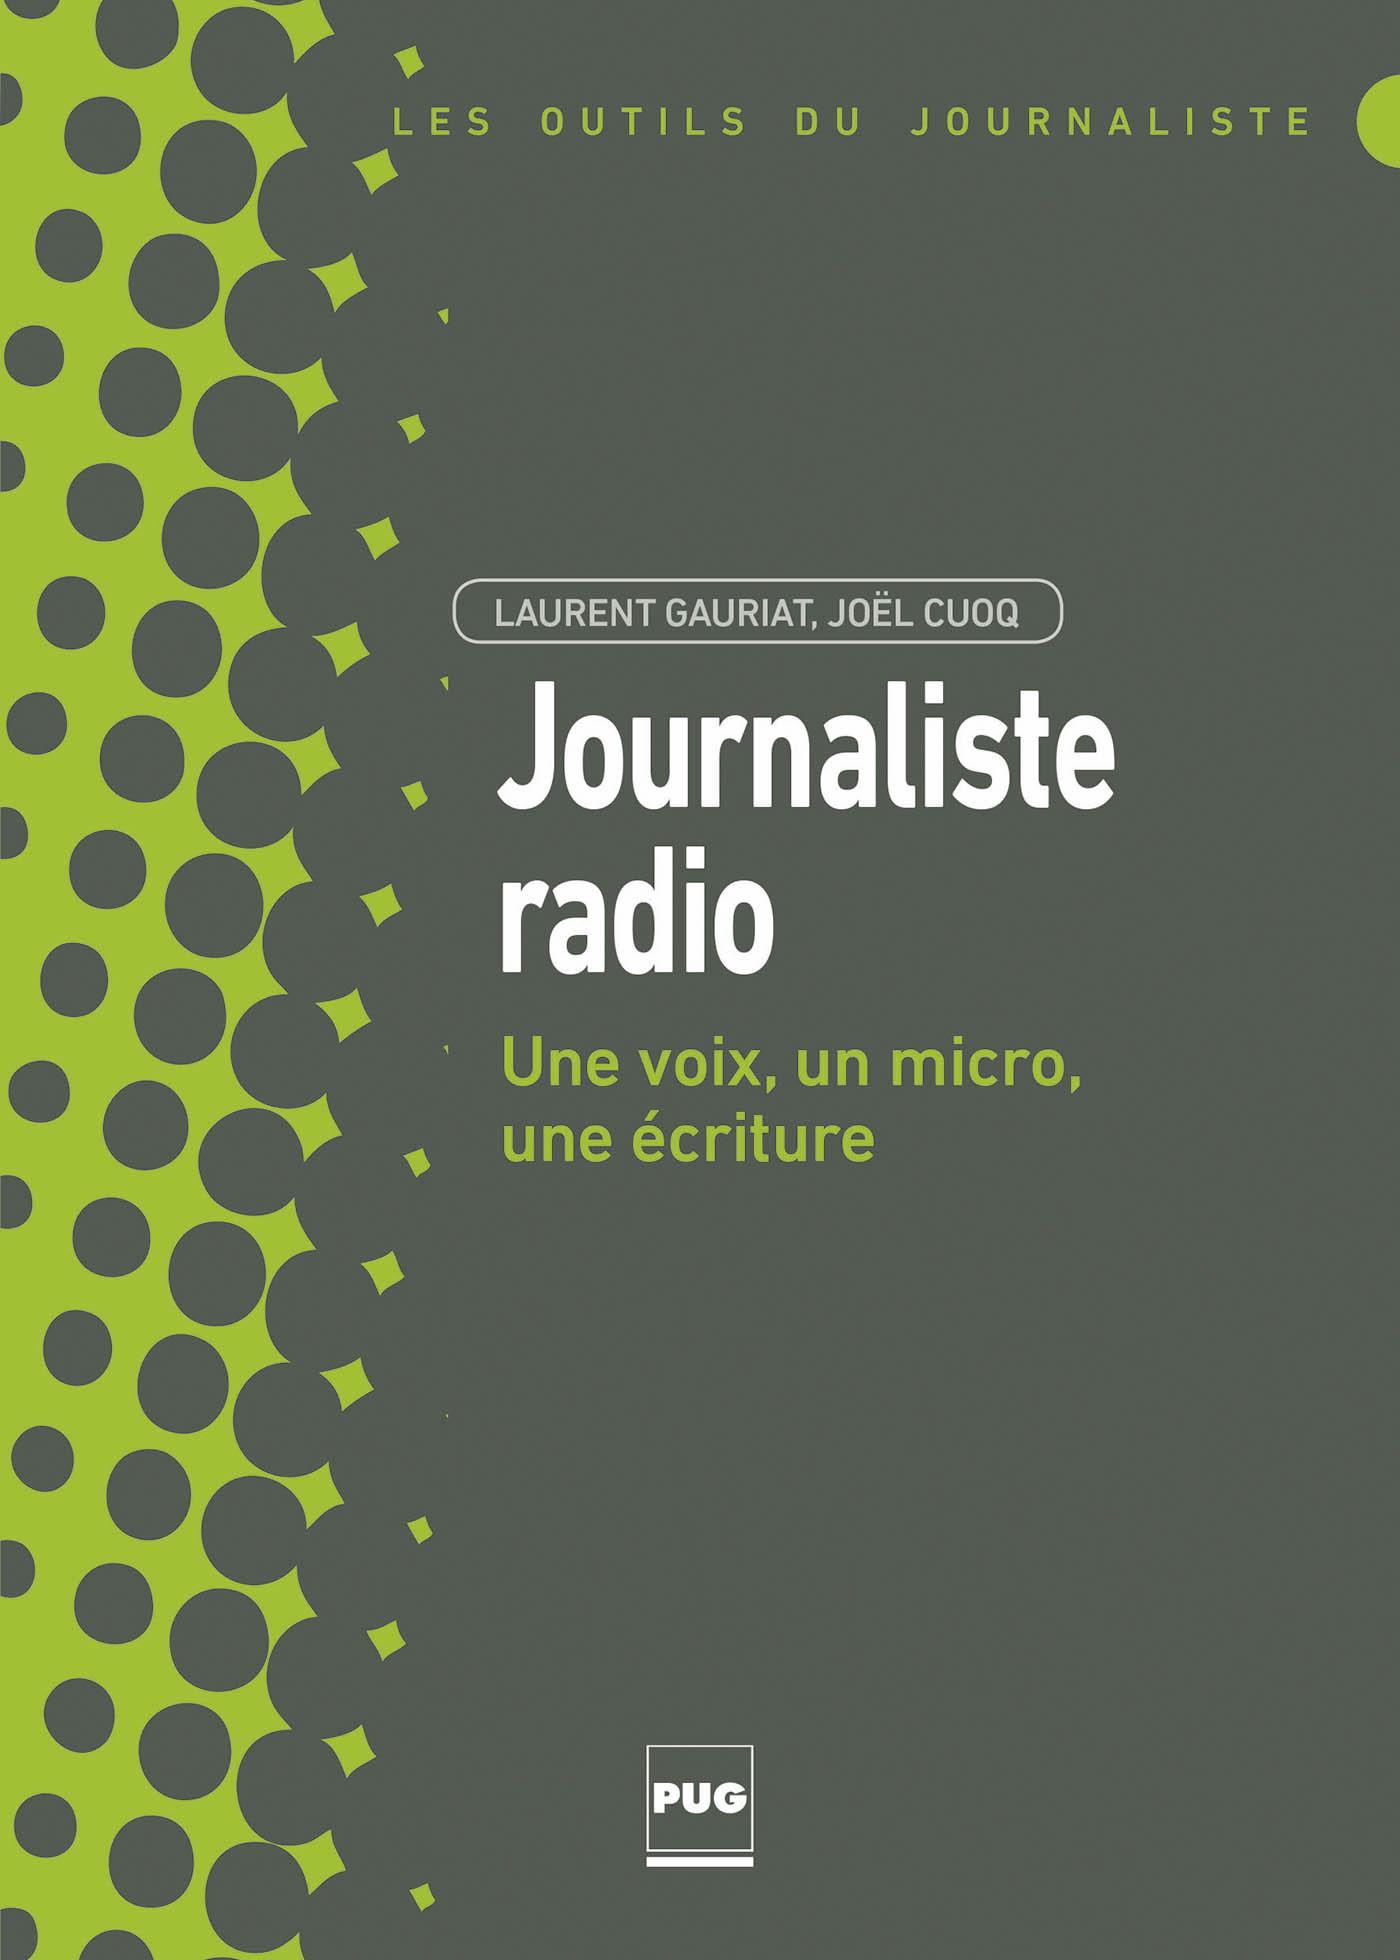 JOURNALISTE RADIO - UNE VOIX, UN MICRO, UNE ECRITURE